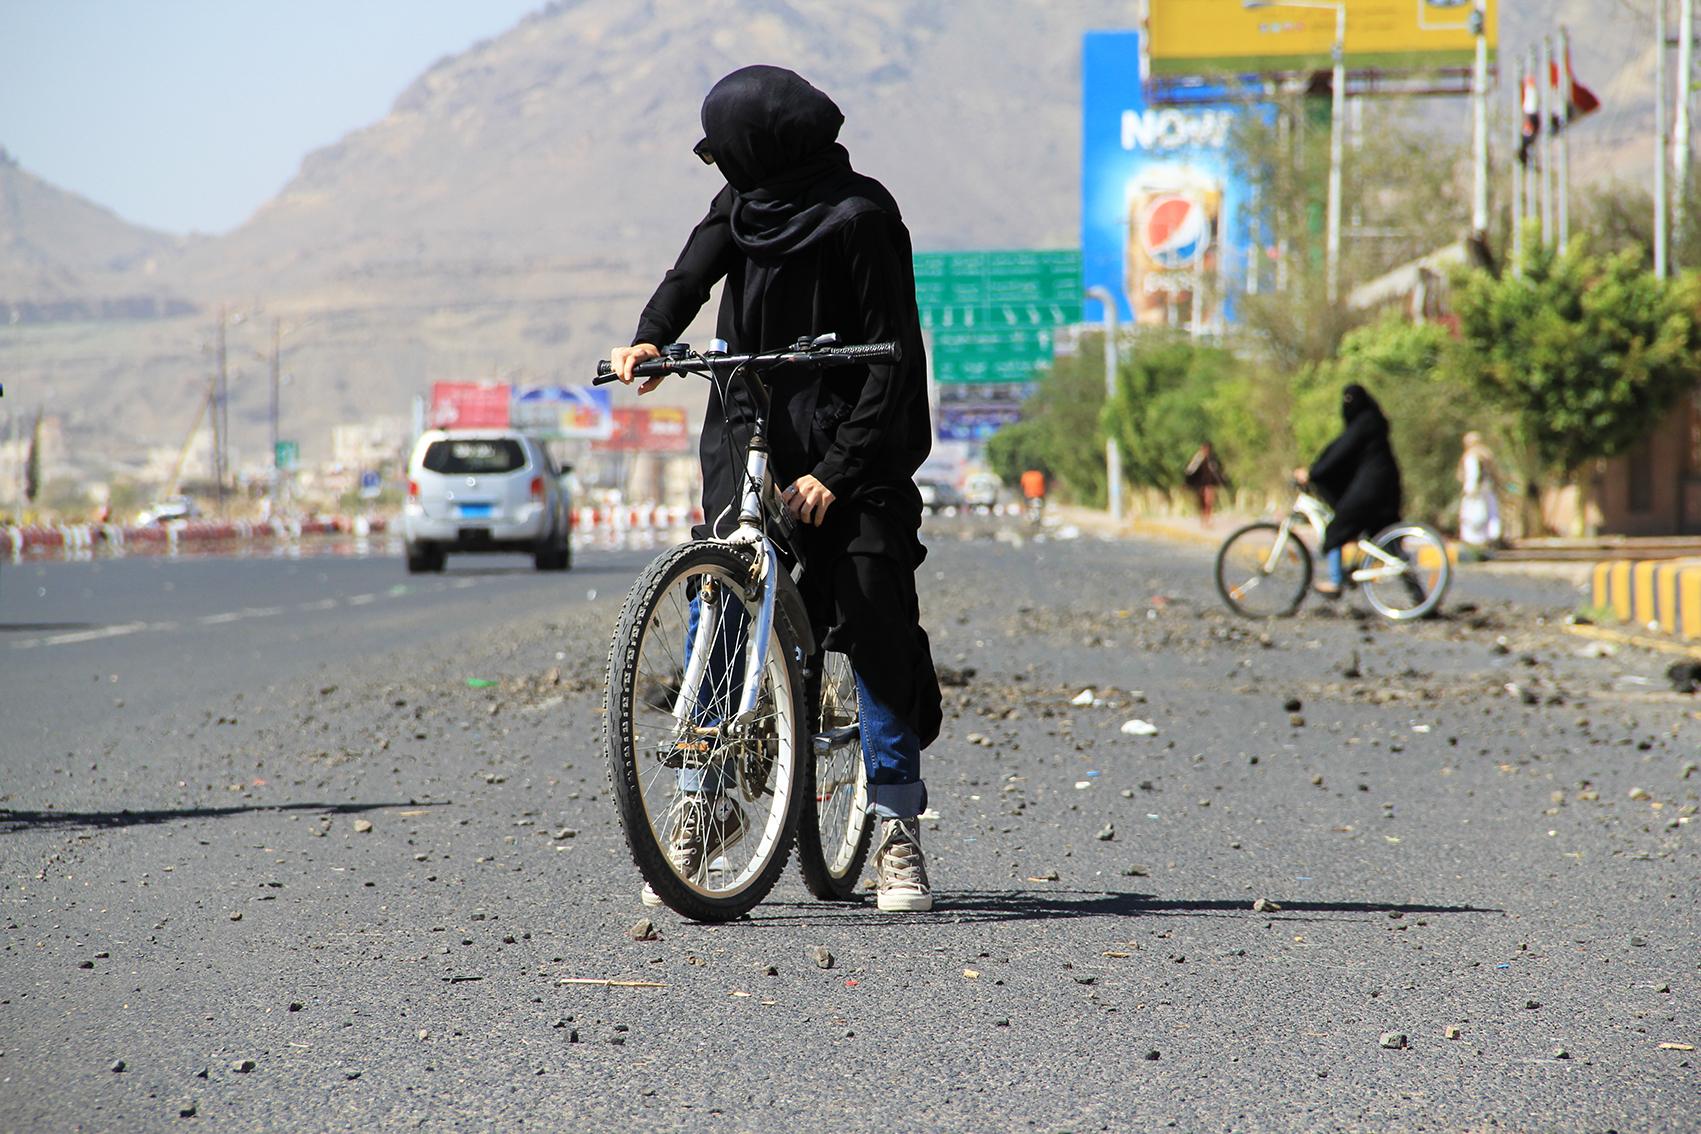 Bike for Yemen. Photo credit: Bushra al-Fusail